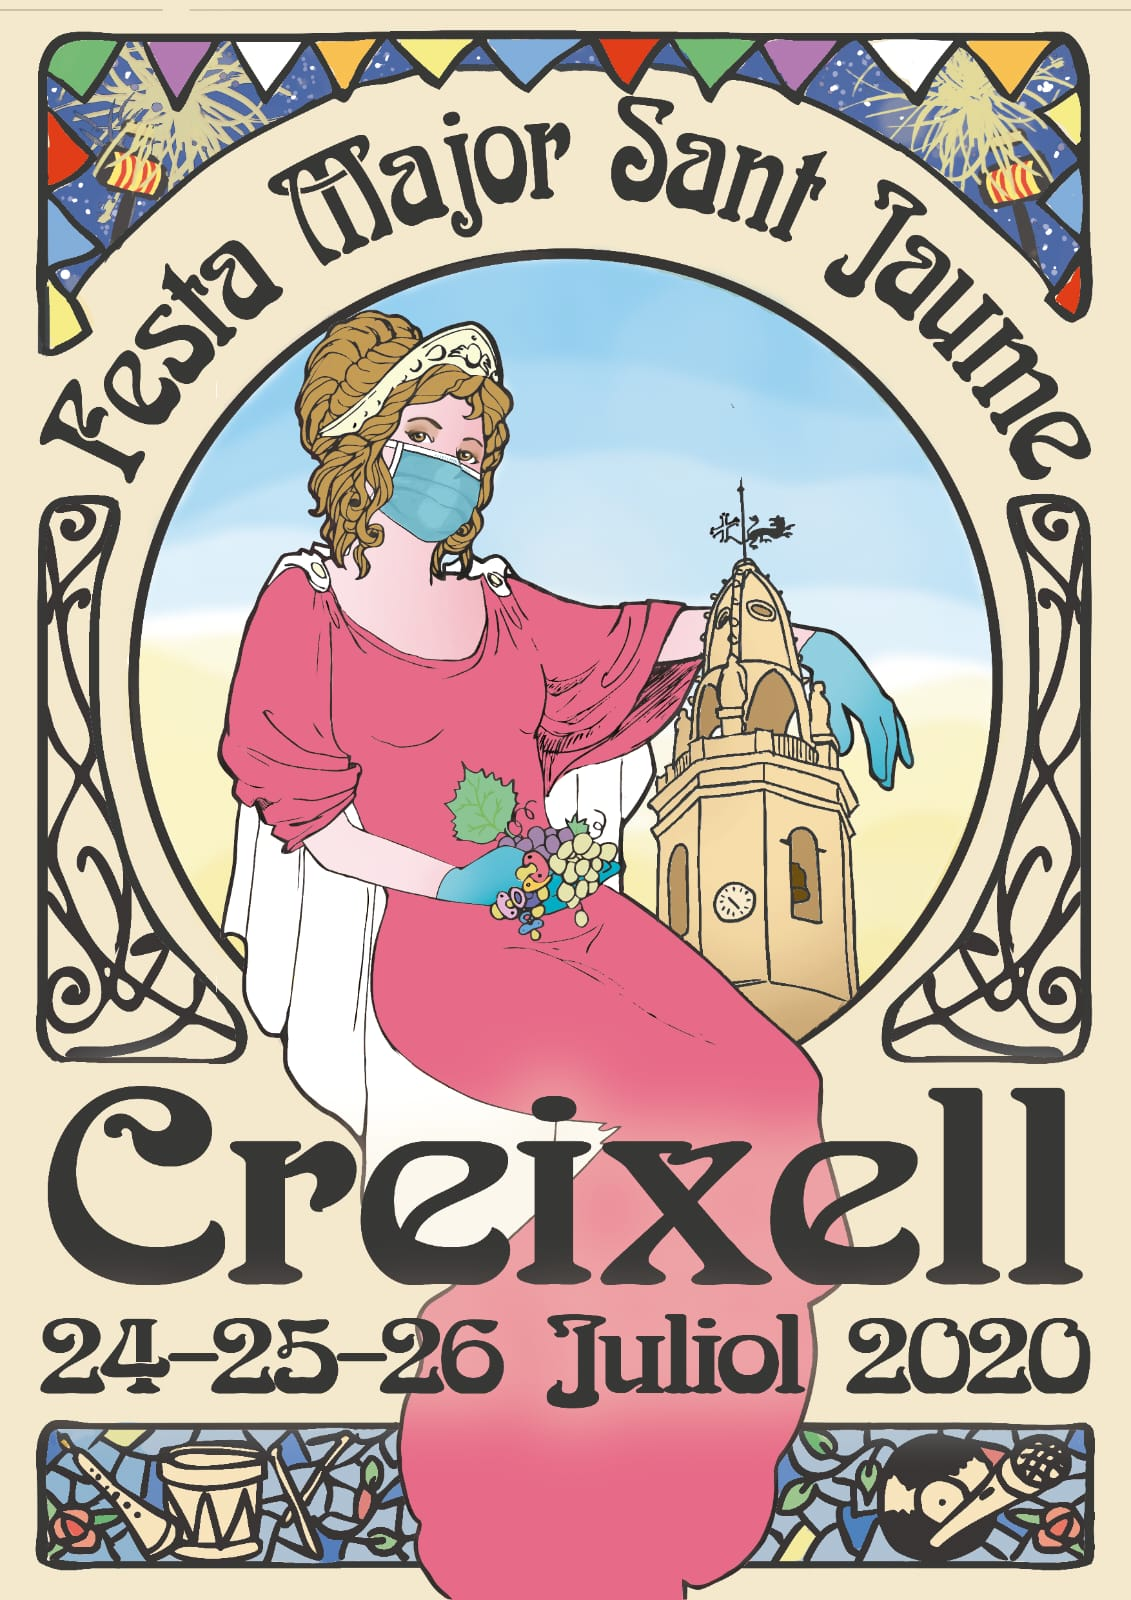 Creixell- Festa Major Sant Jaume 2020 – 300×600